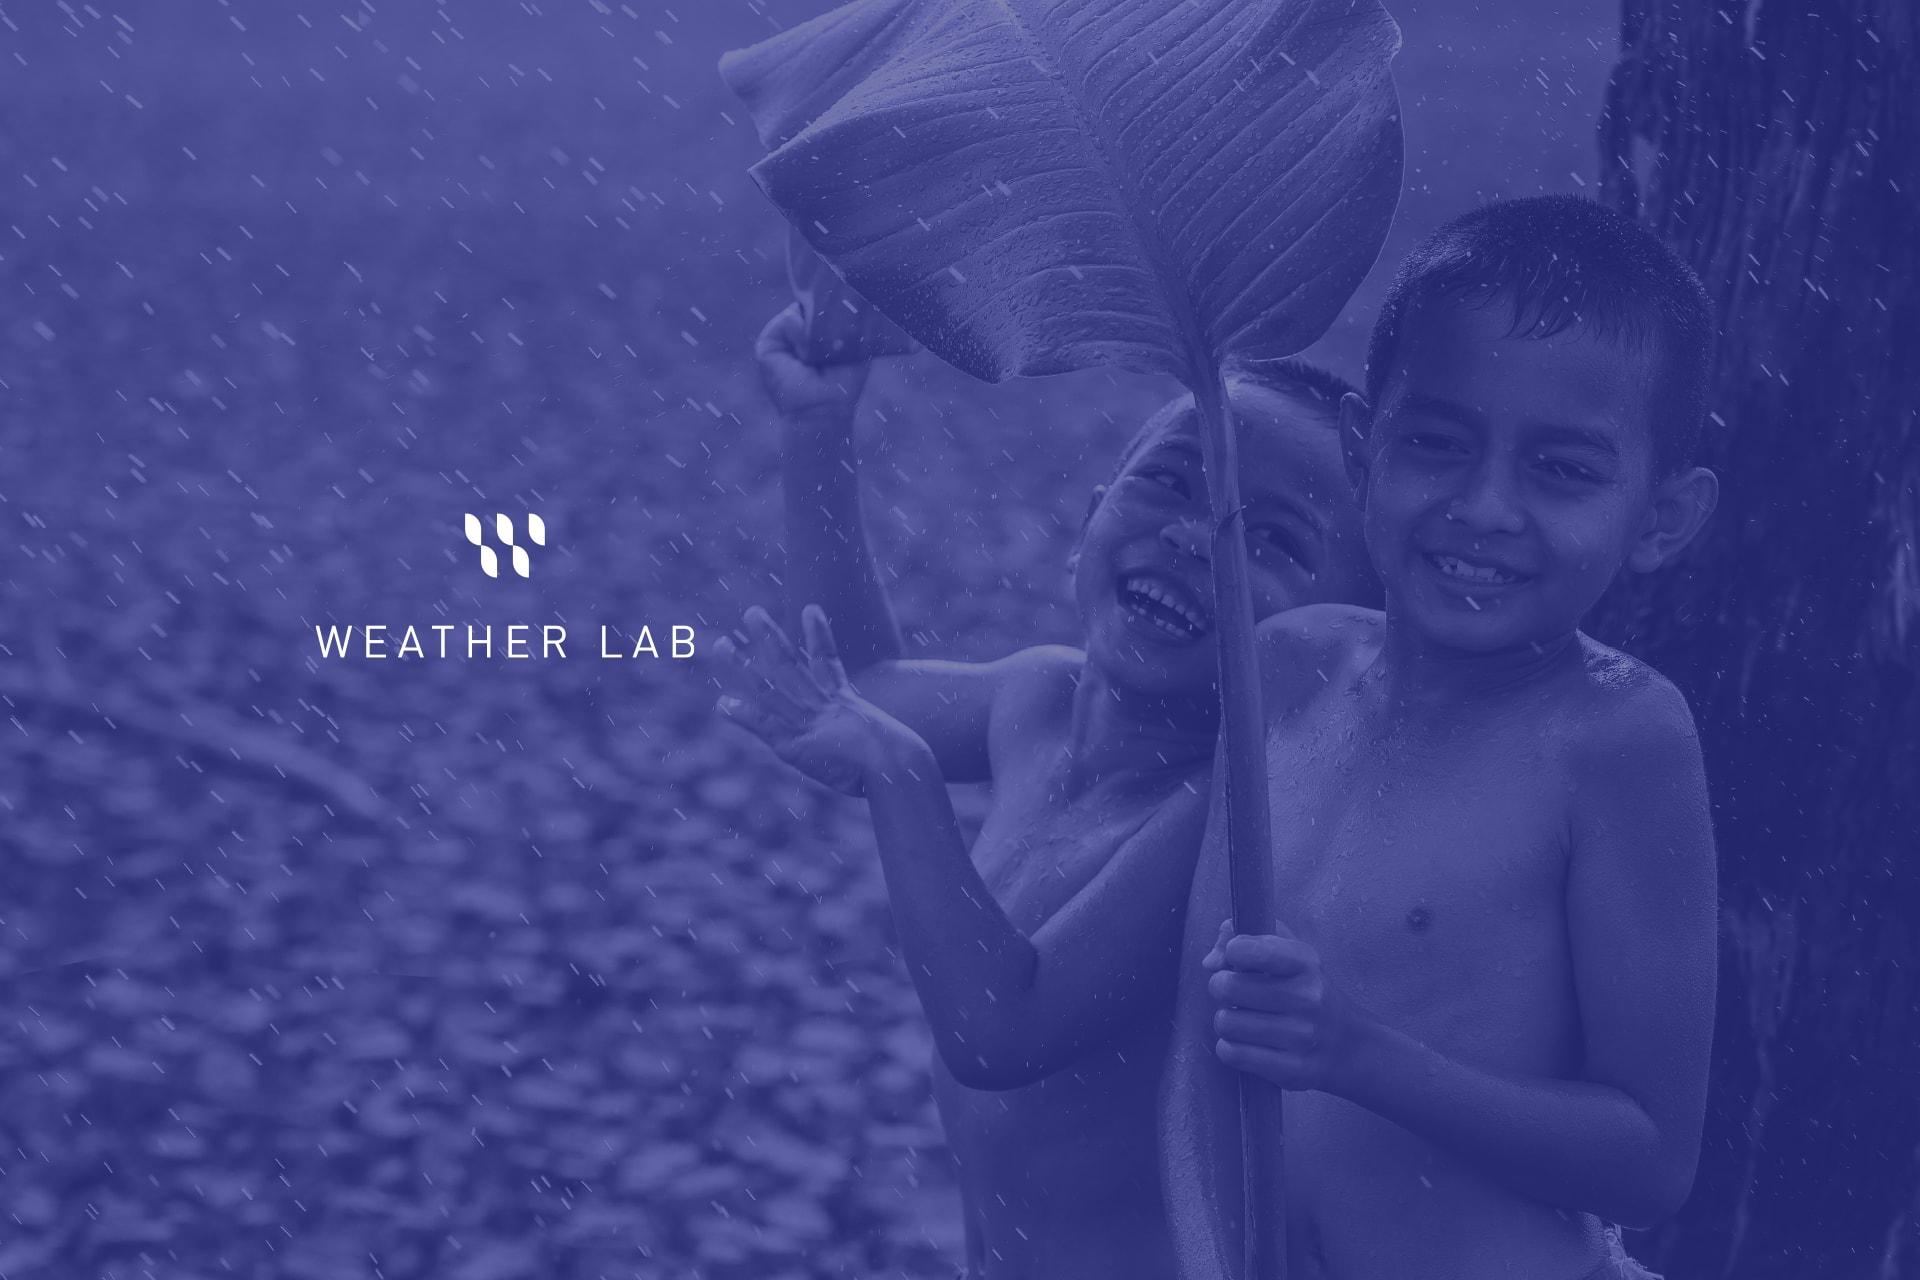 weatherlab1 - Natie Branding Agency